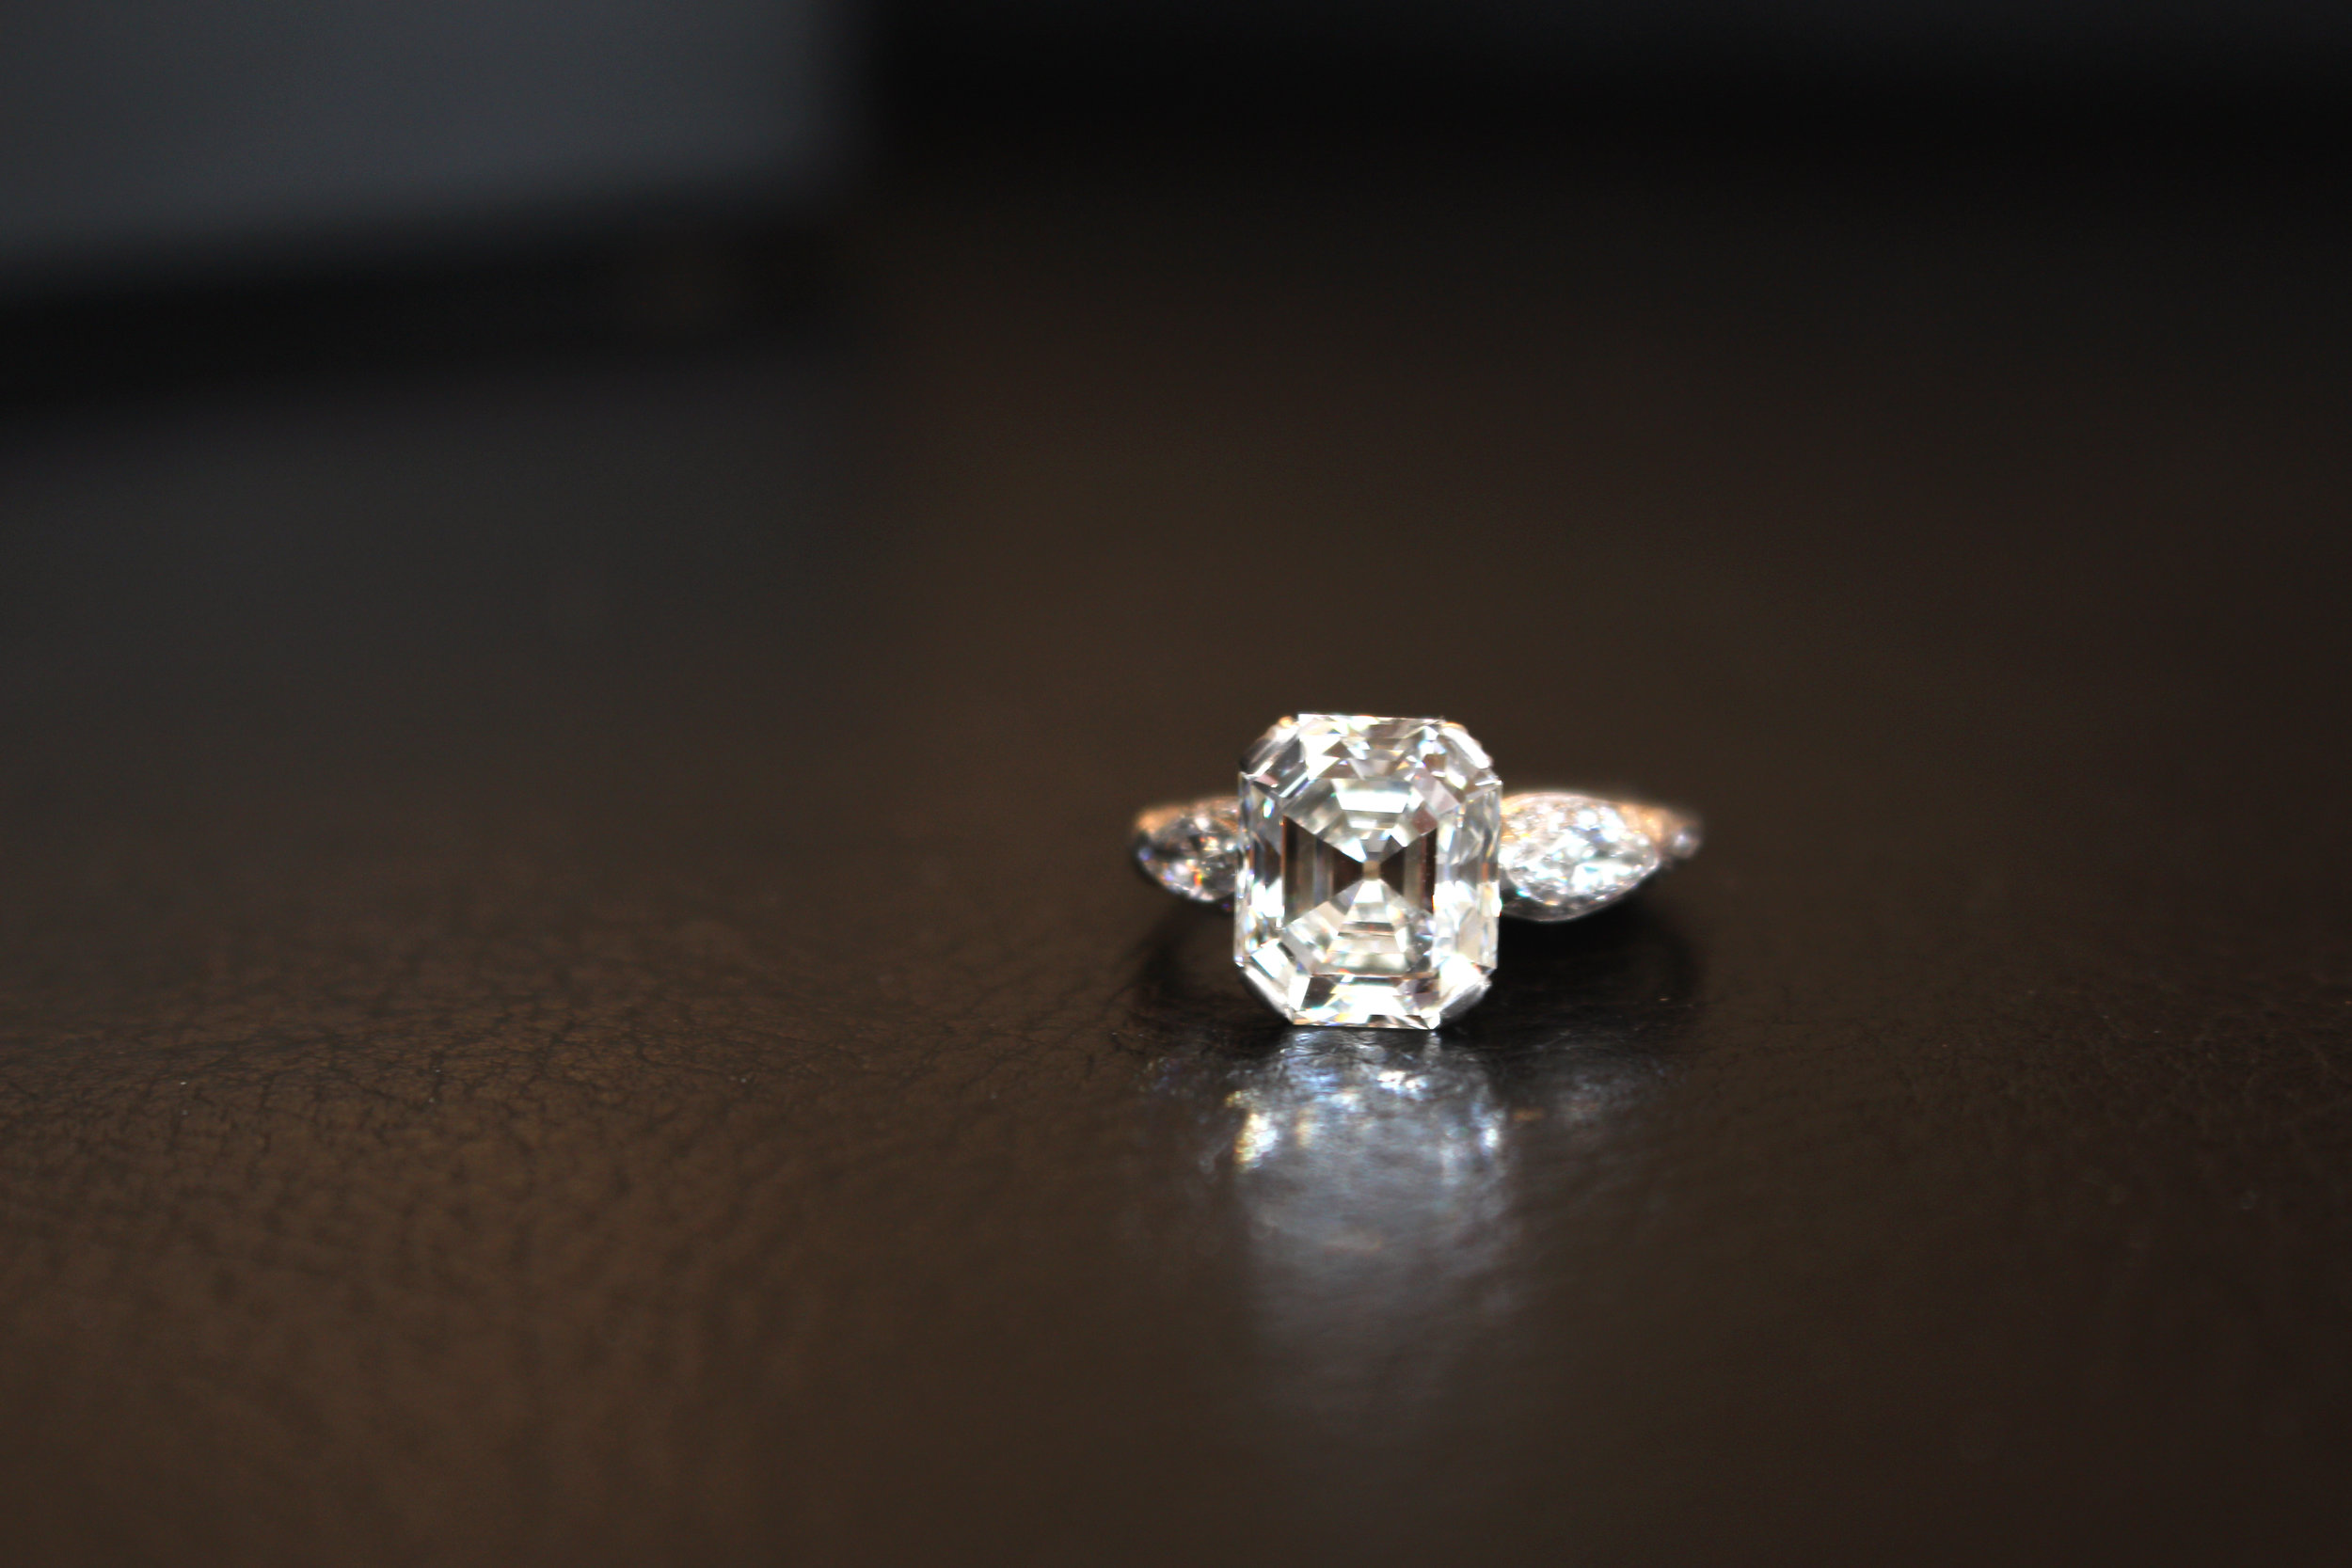 4.77 carat early Art Deco diamond ring